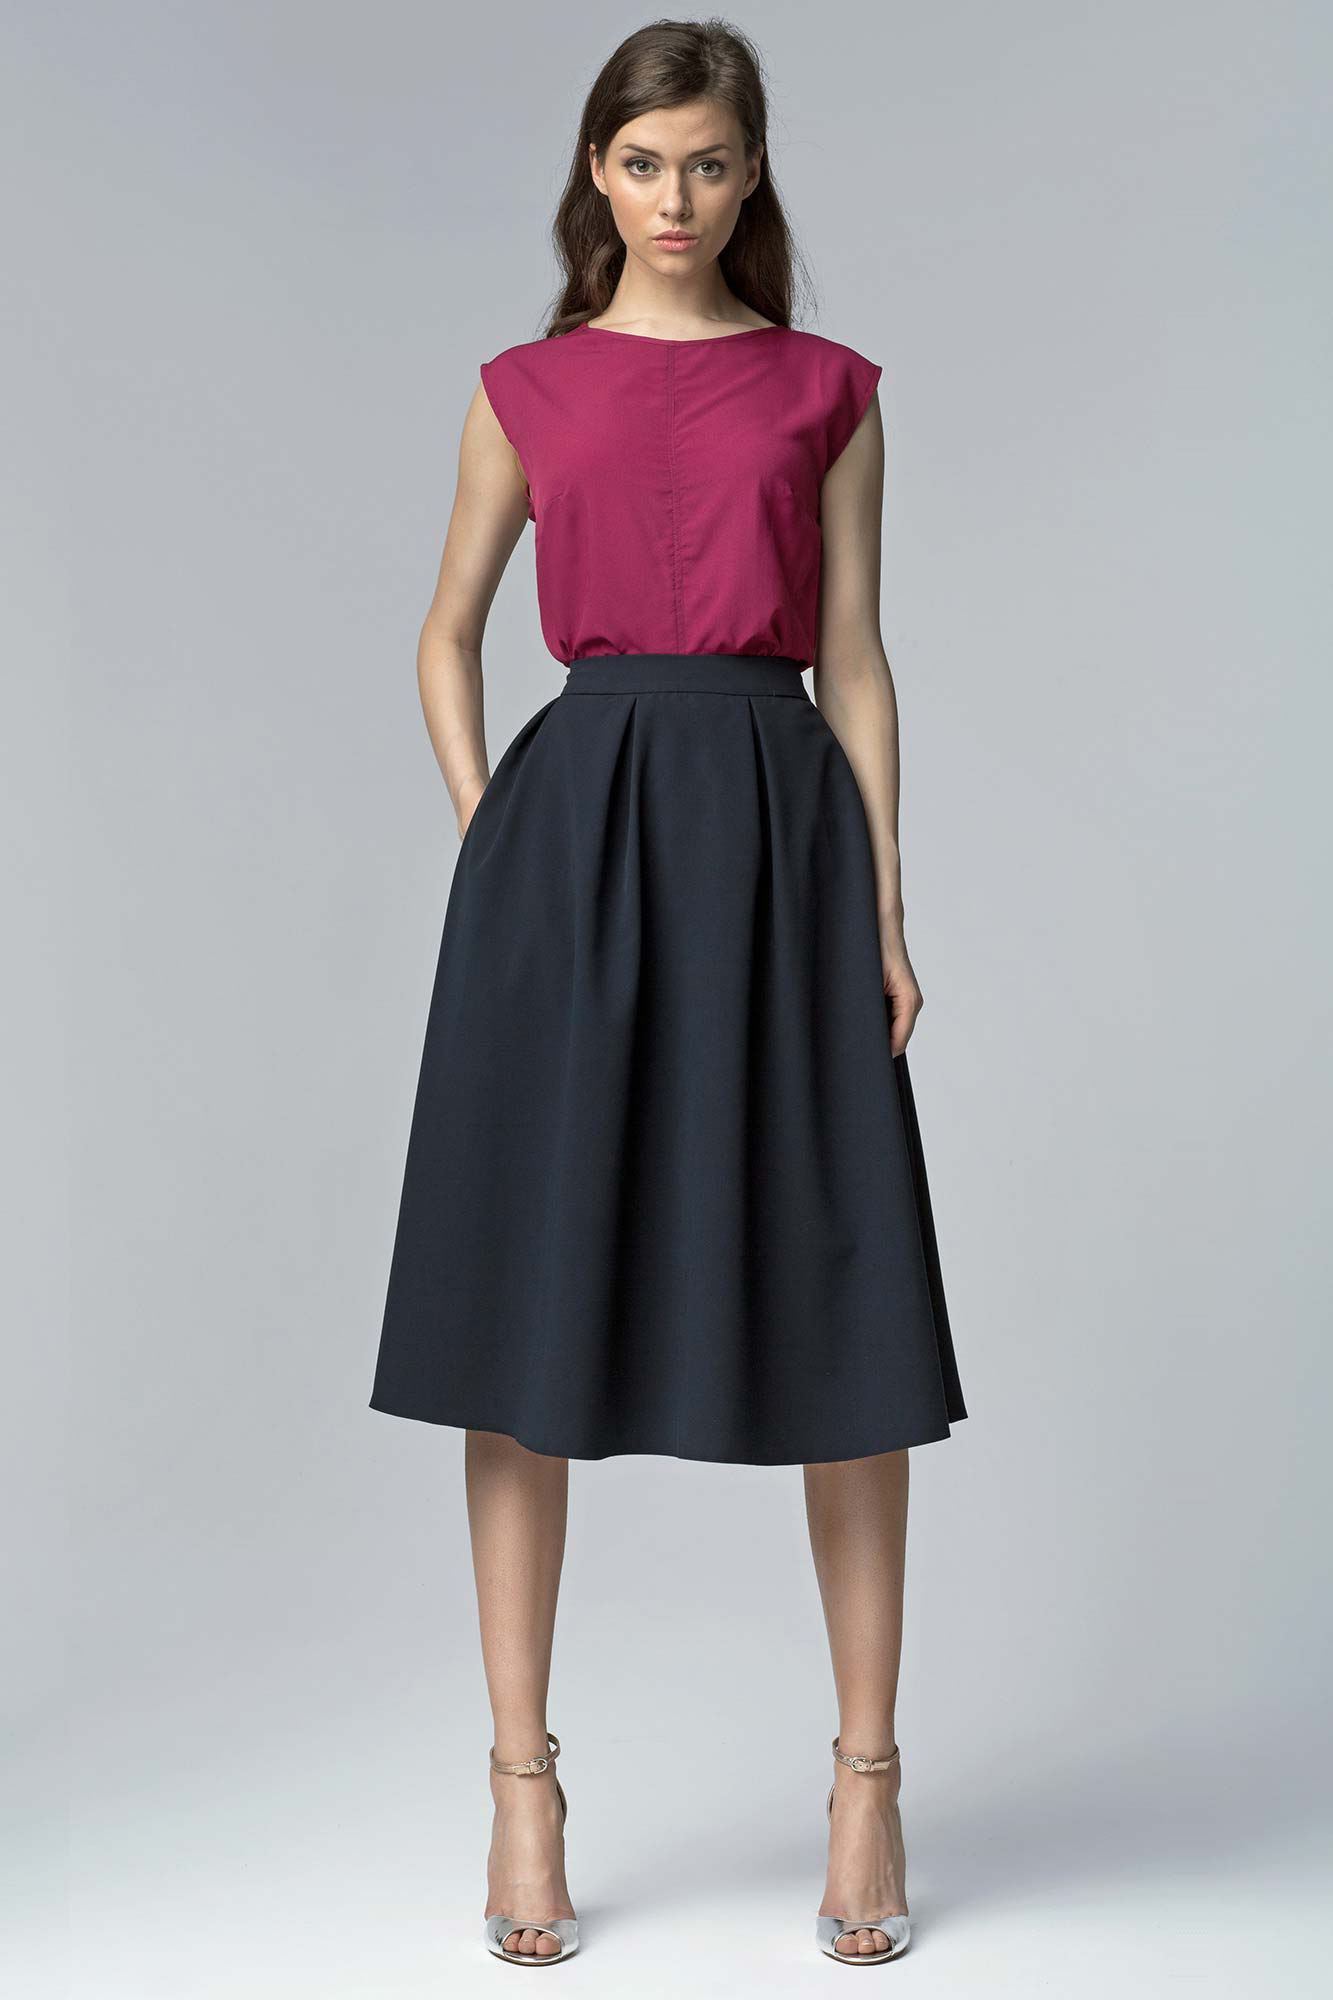 acheter une jupe cloche pliss e taille haute mode. Black Bedroom Furniture Sets. Home Design Ideas